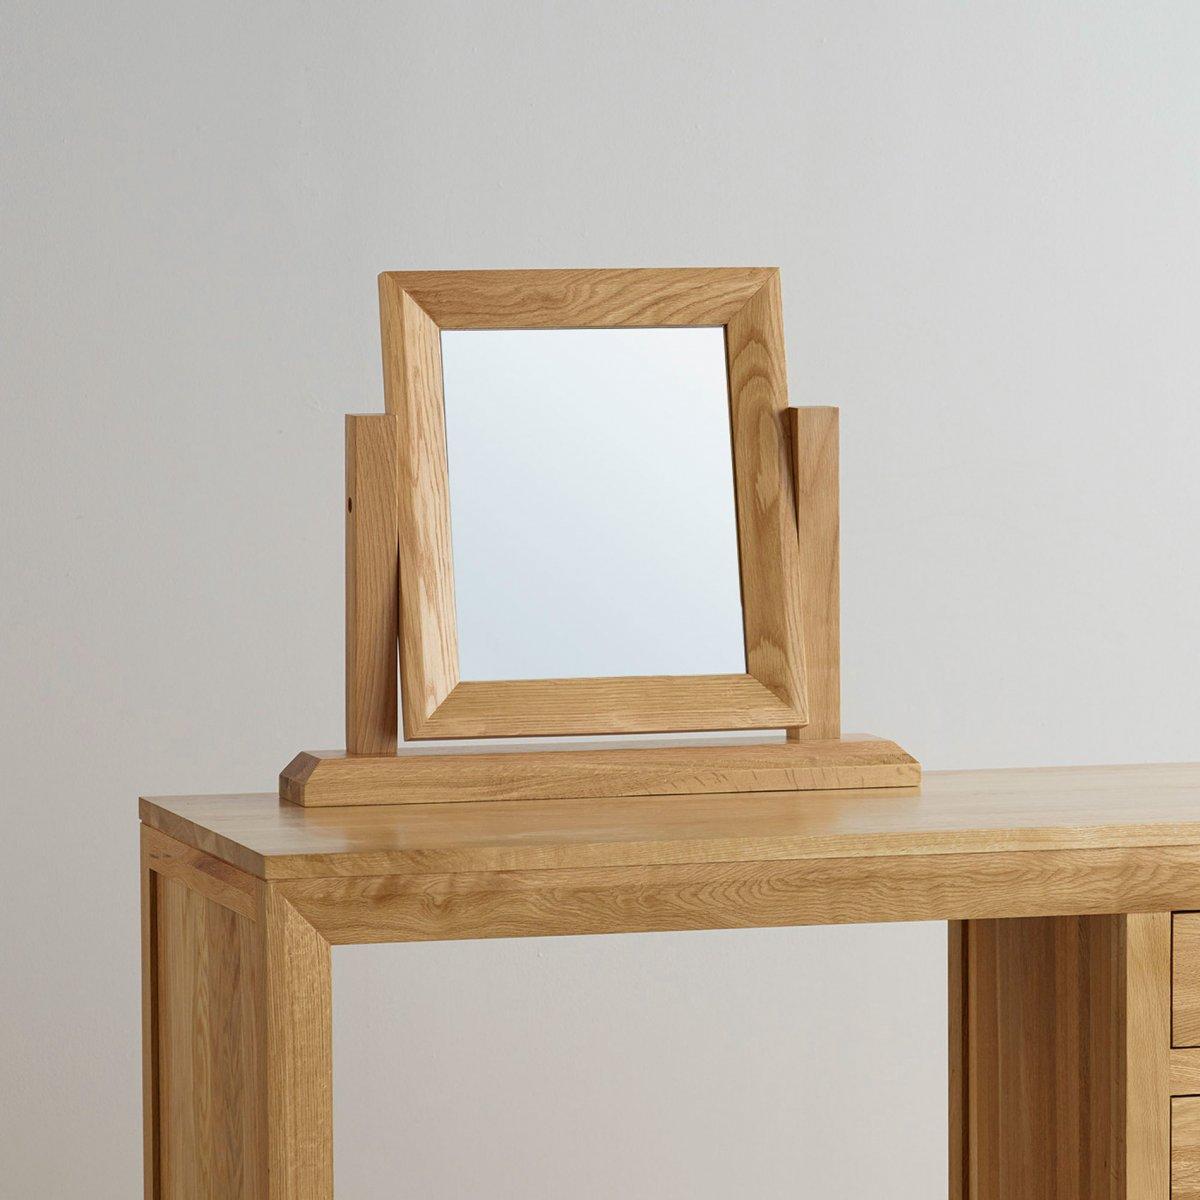 Bevel dressing table mirror in solid oak furniture land